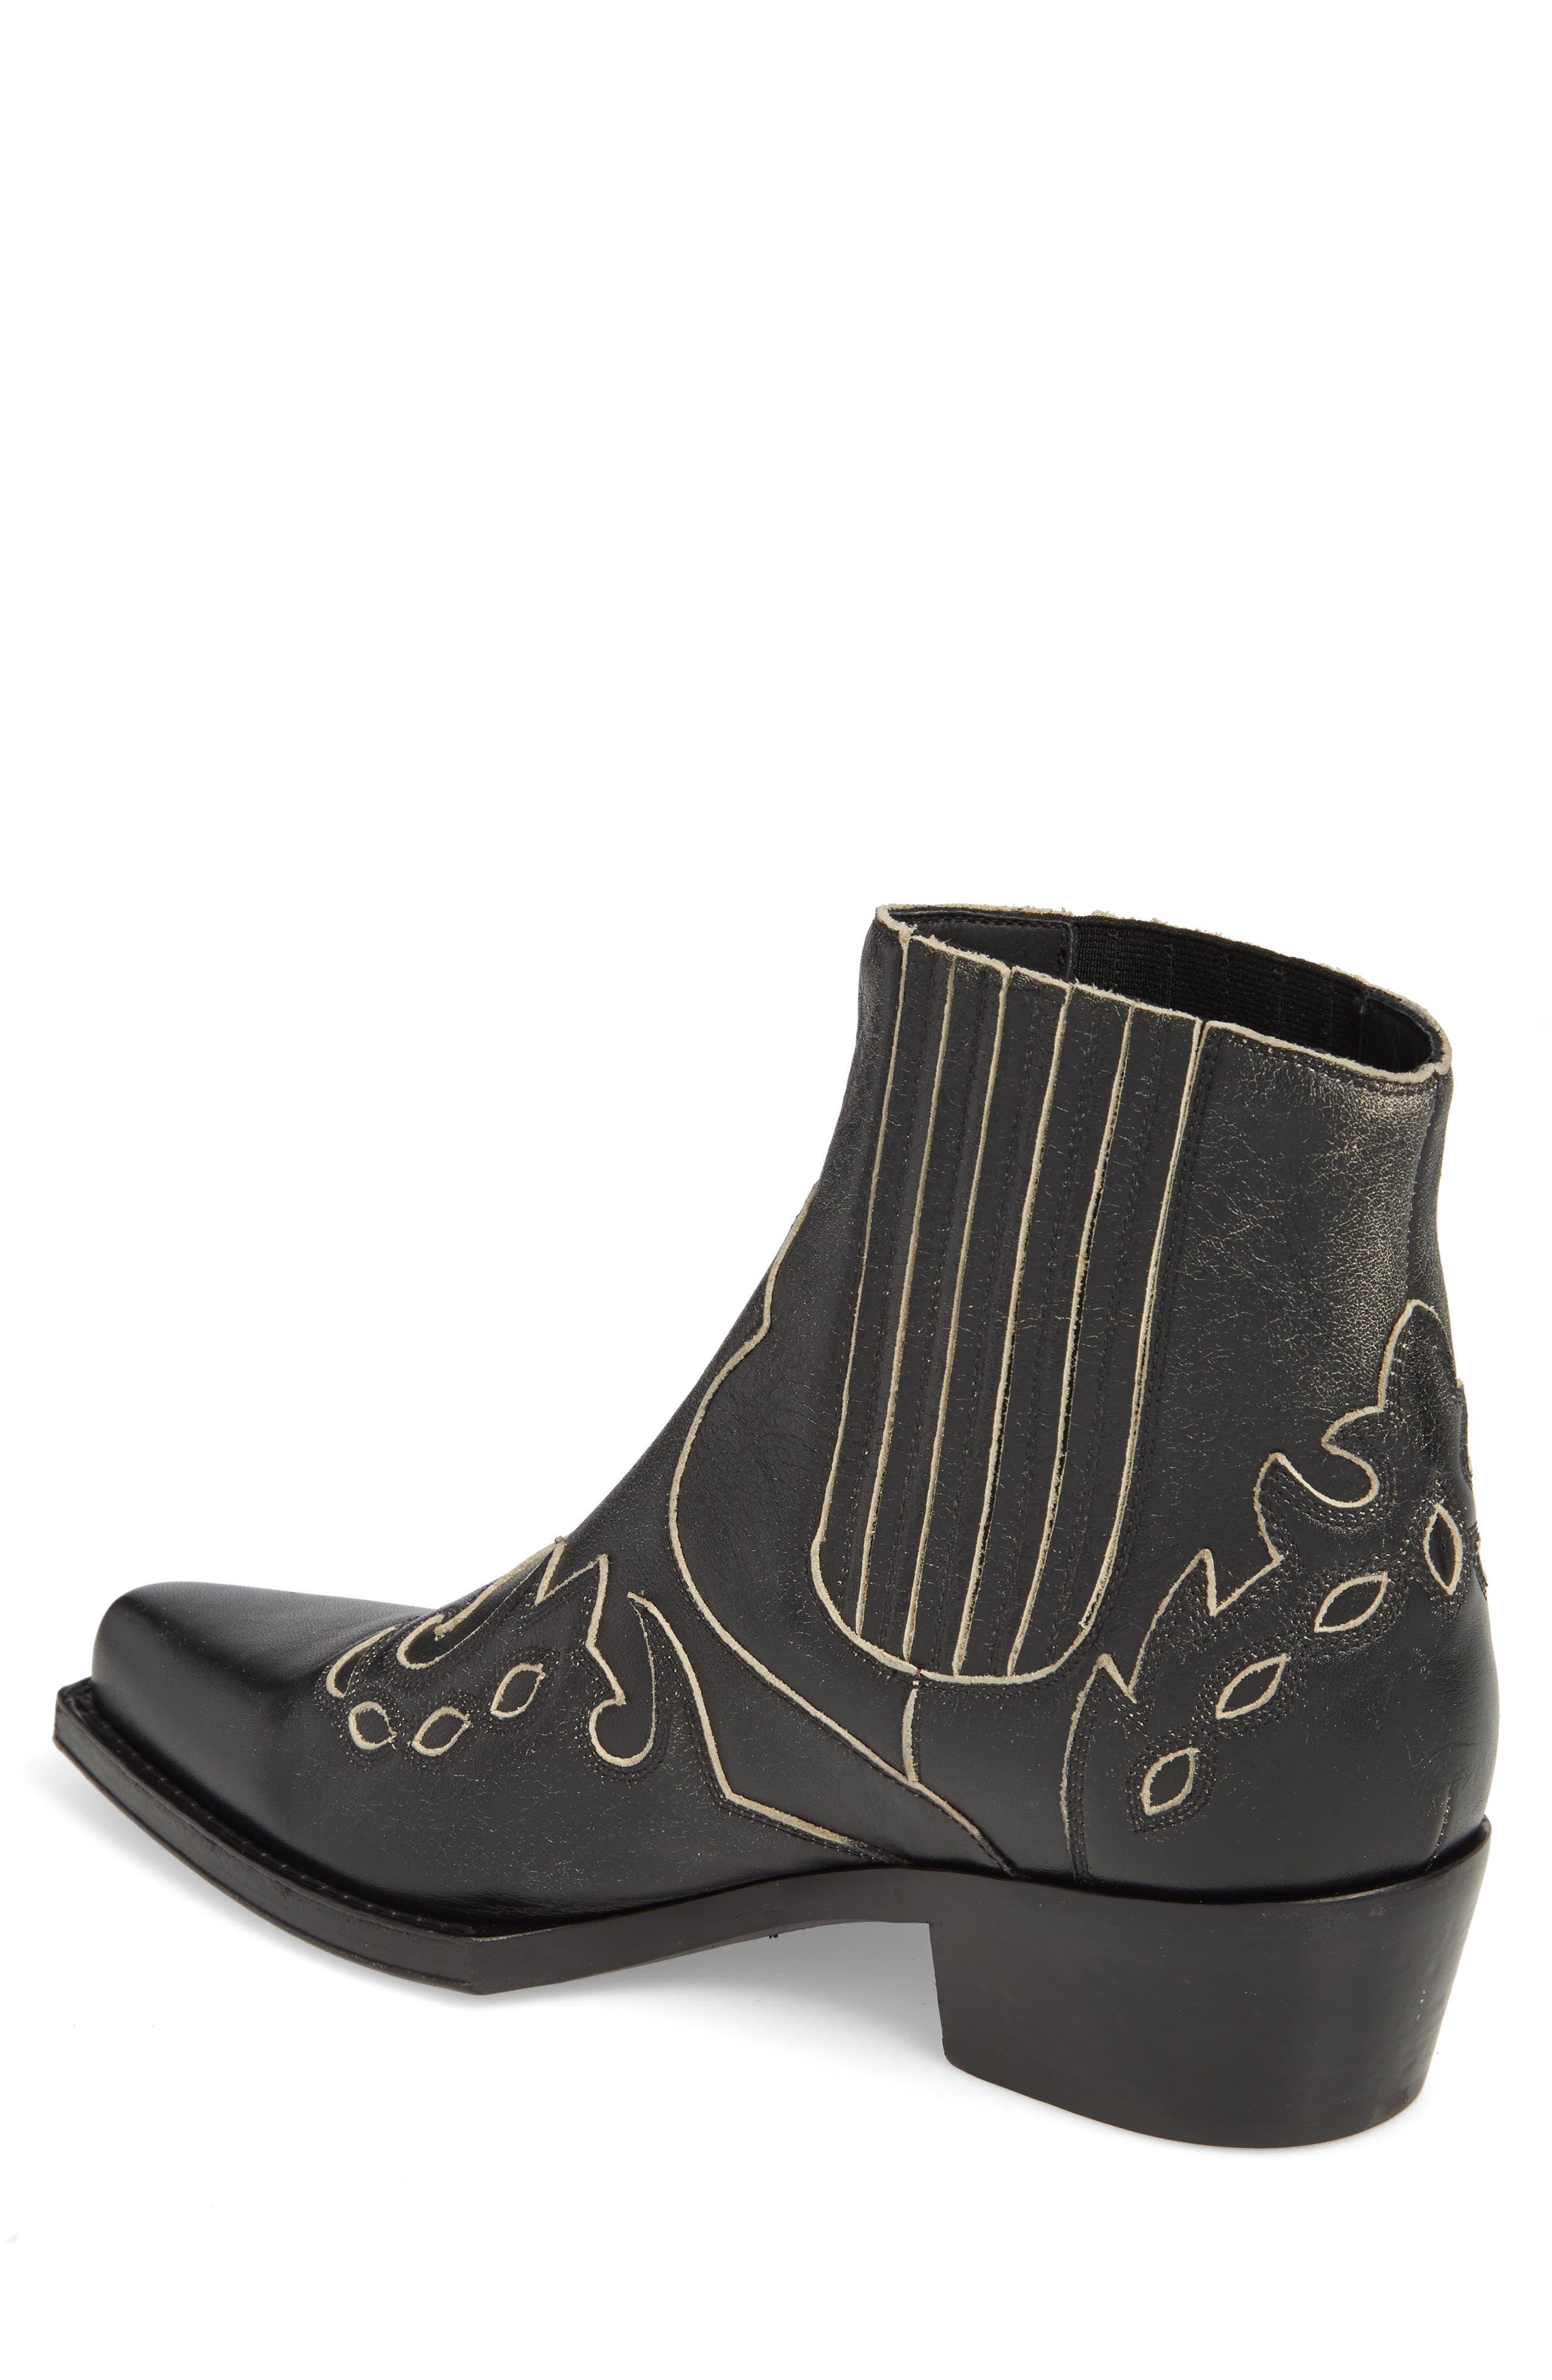 Cal Calvert Cowboy Boot,                             Alternate thumbnail 2, color,                             001